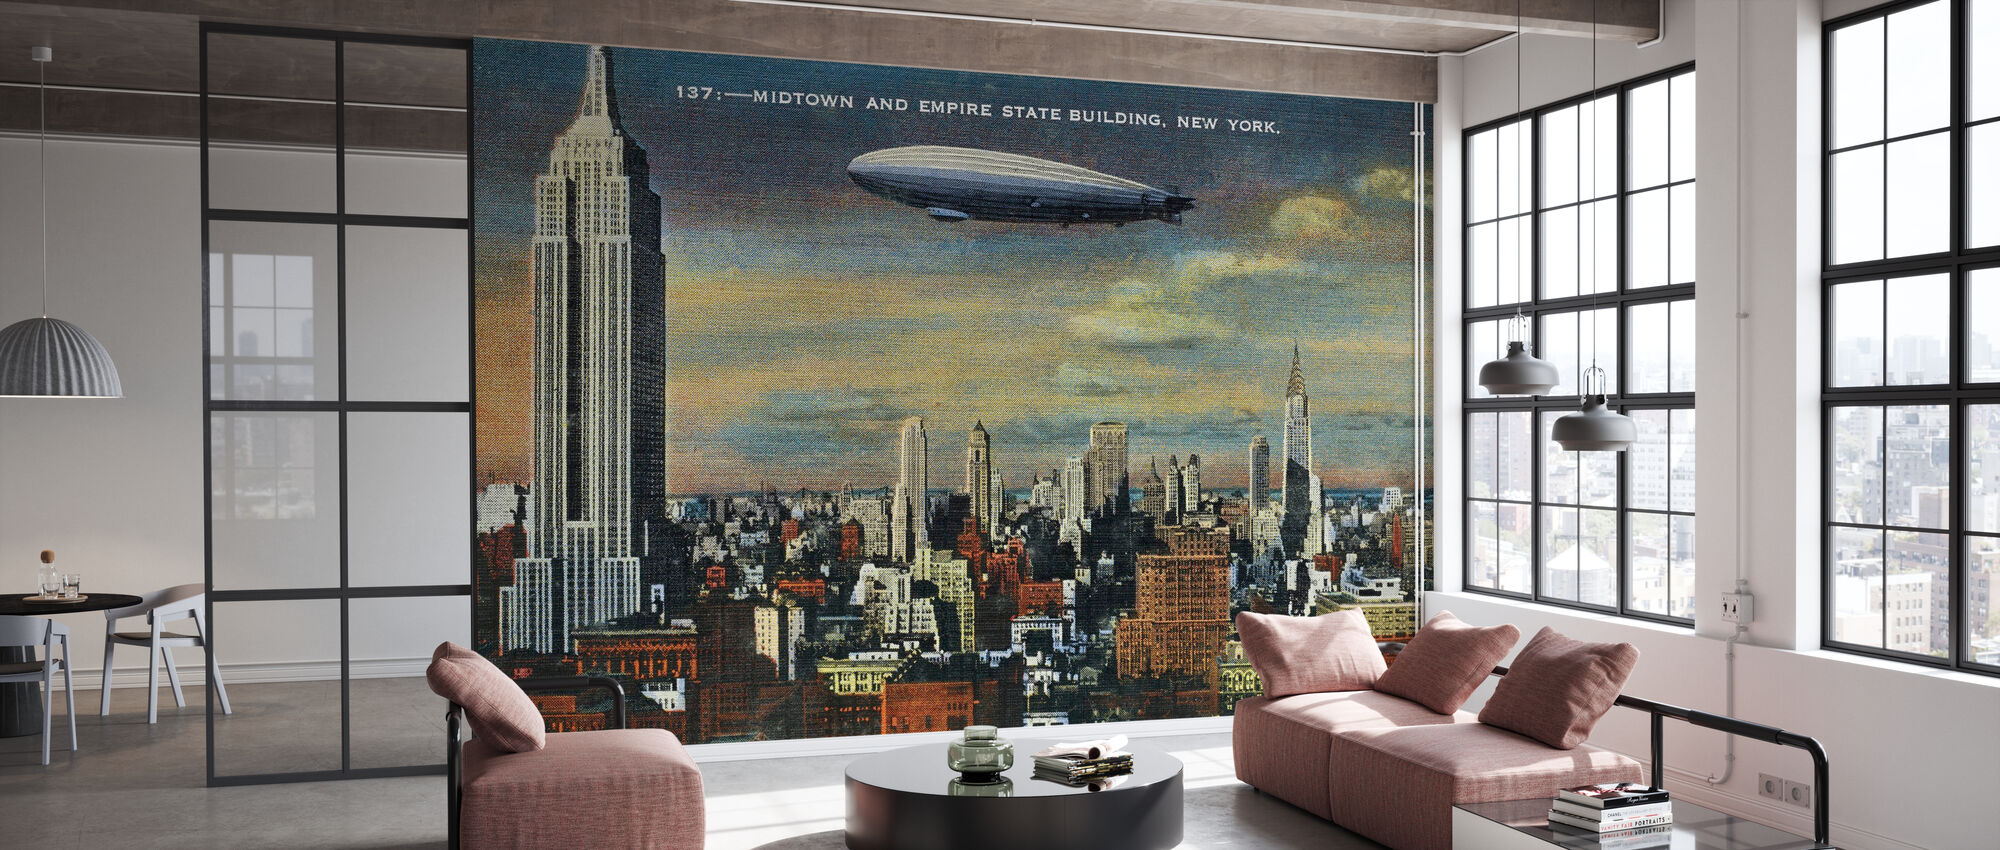 Midtown New York - Wallpaper - Office